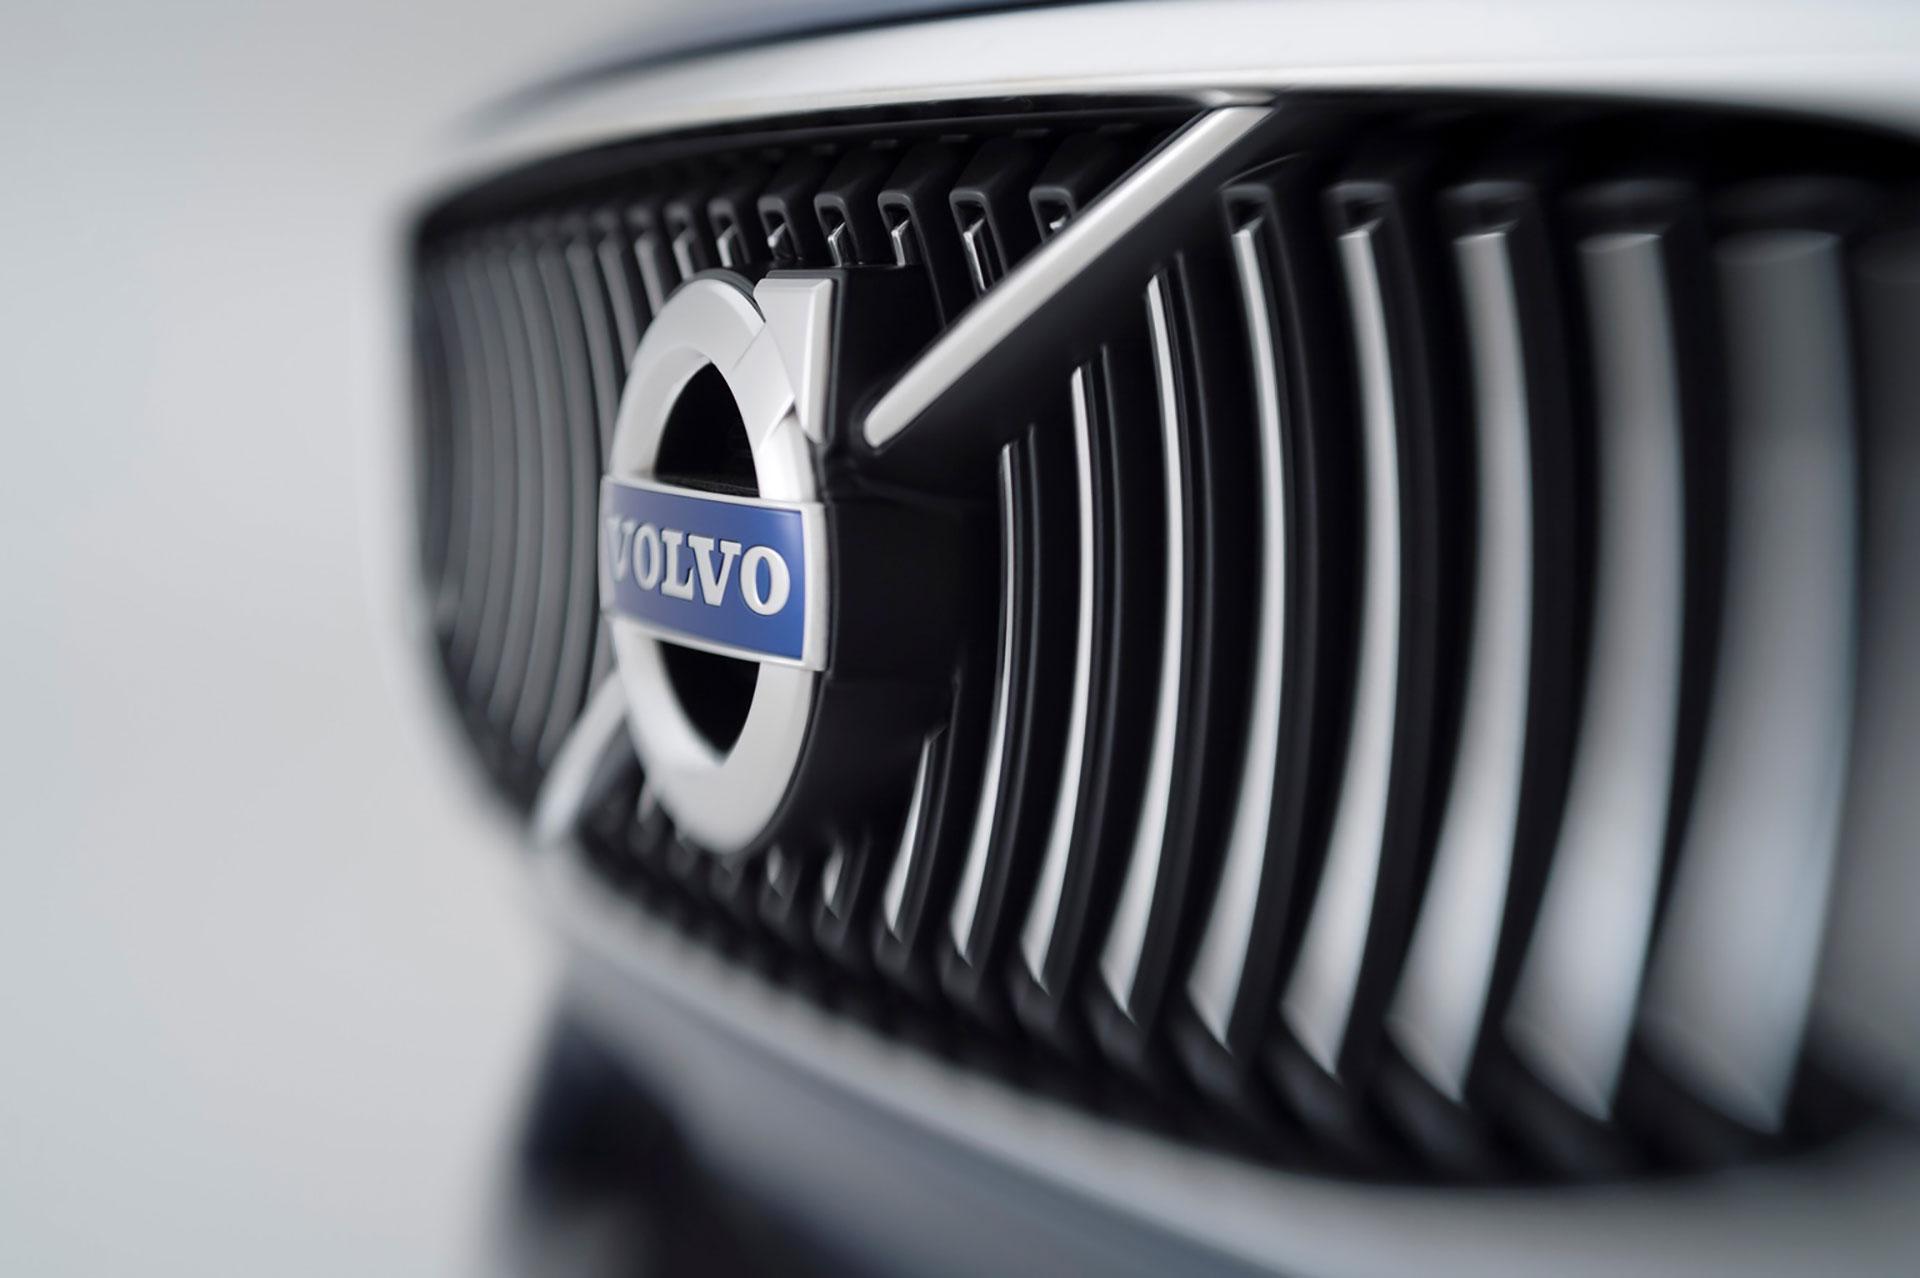 volvo car logo wallpaper pictures 59097